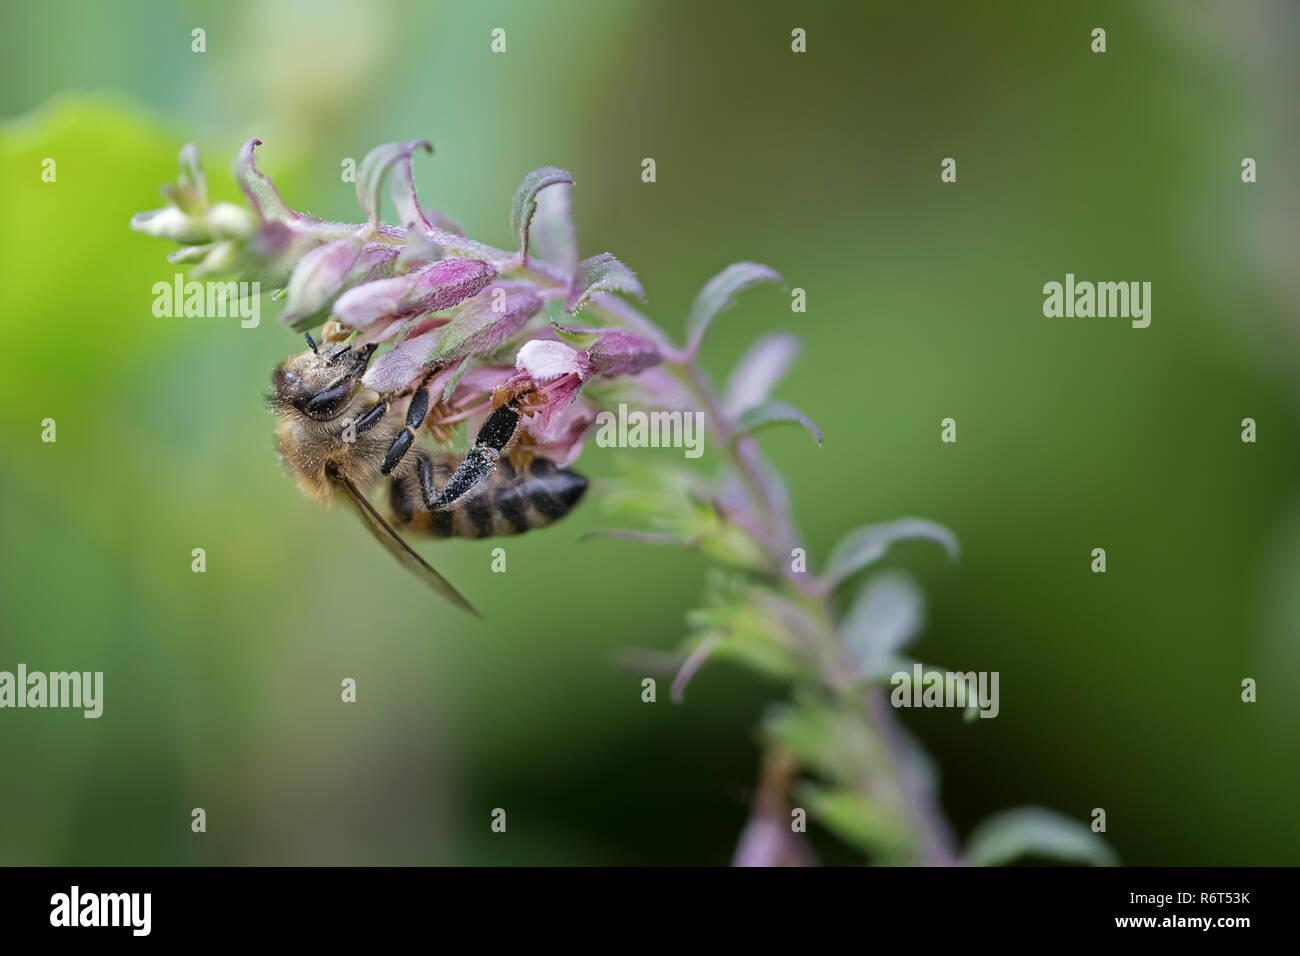 honeybee collecting nectar macrophotography - Stock Image